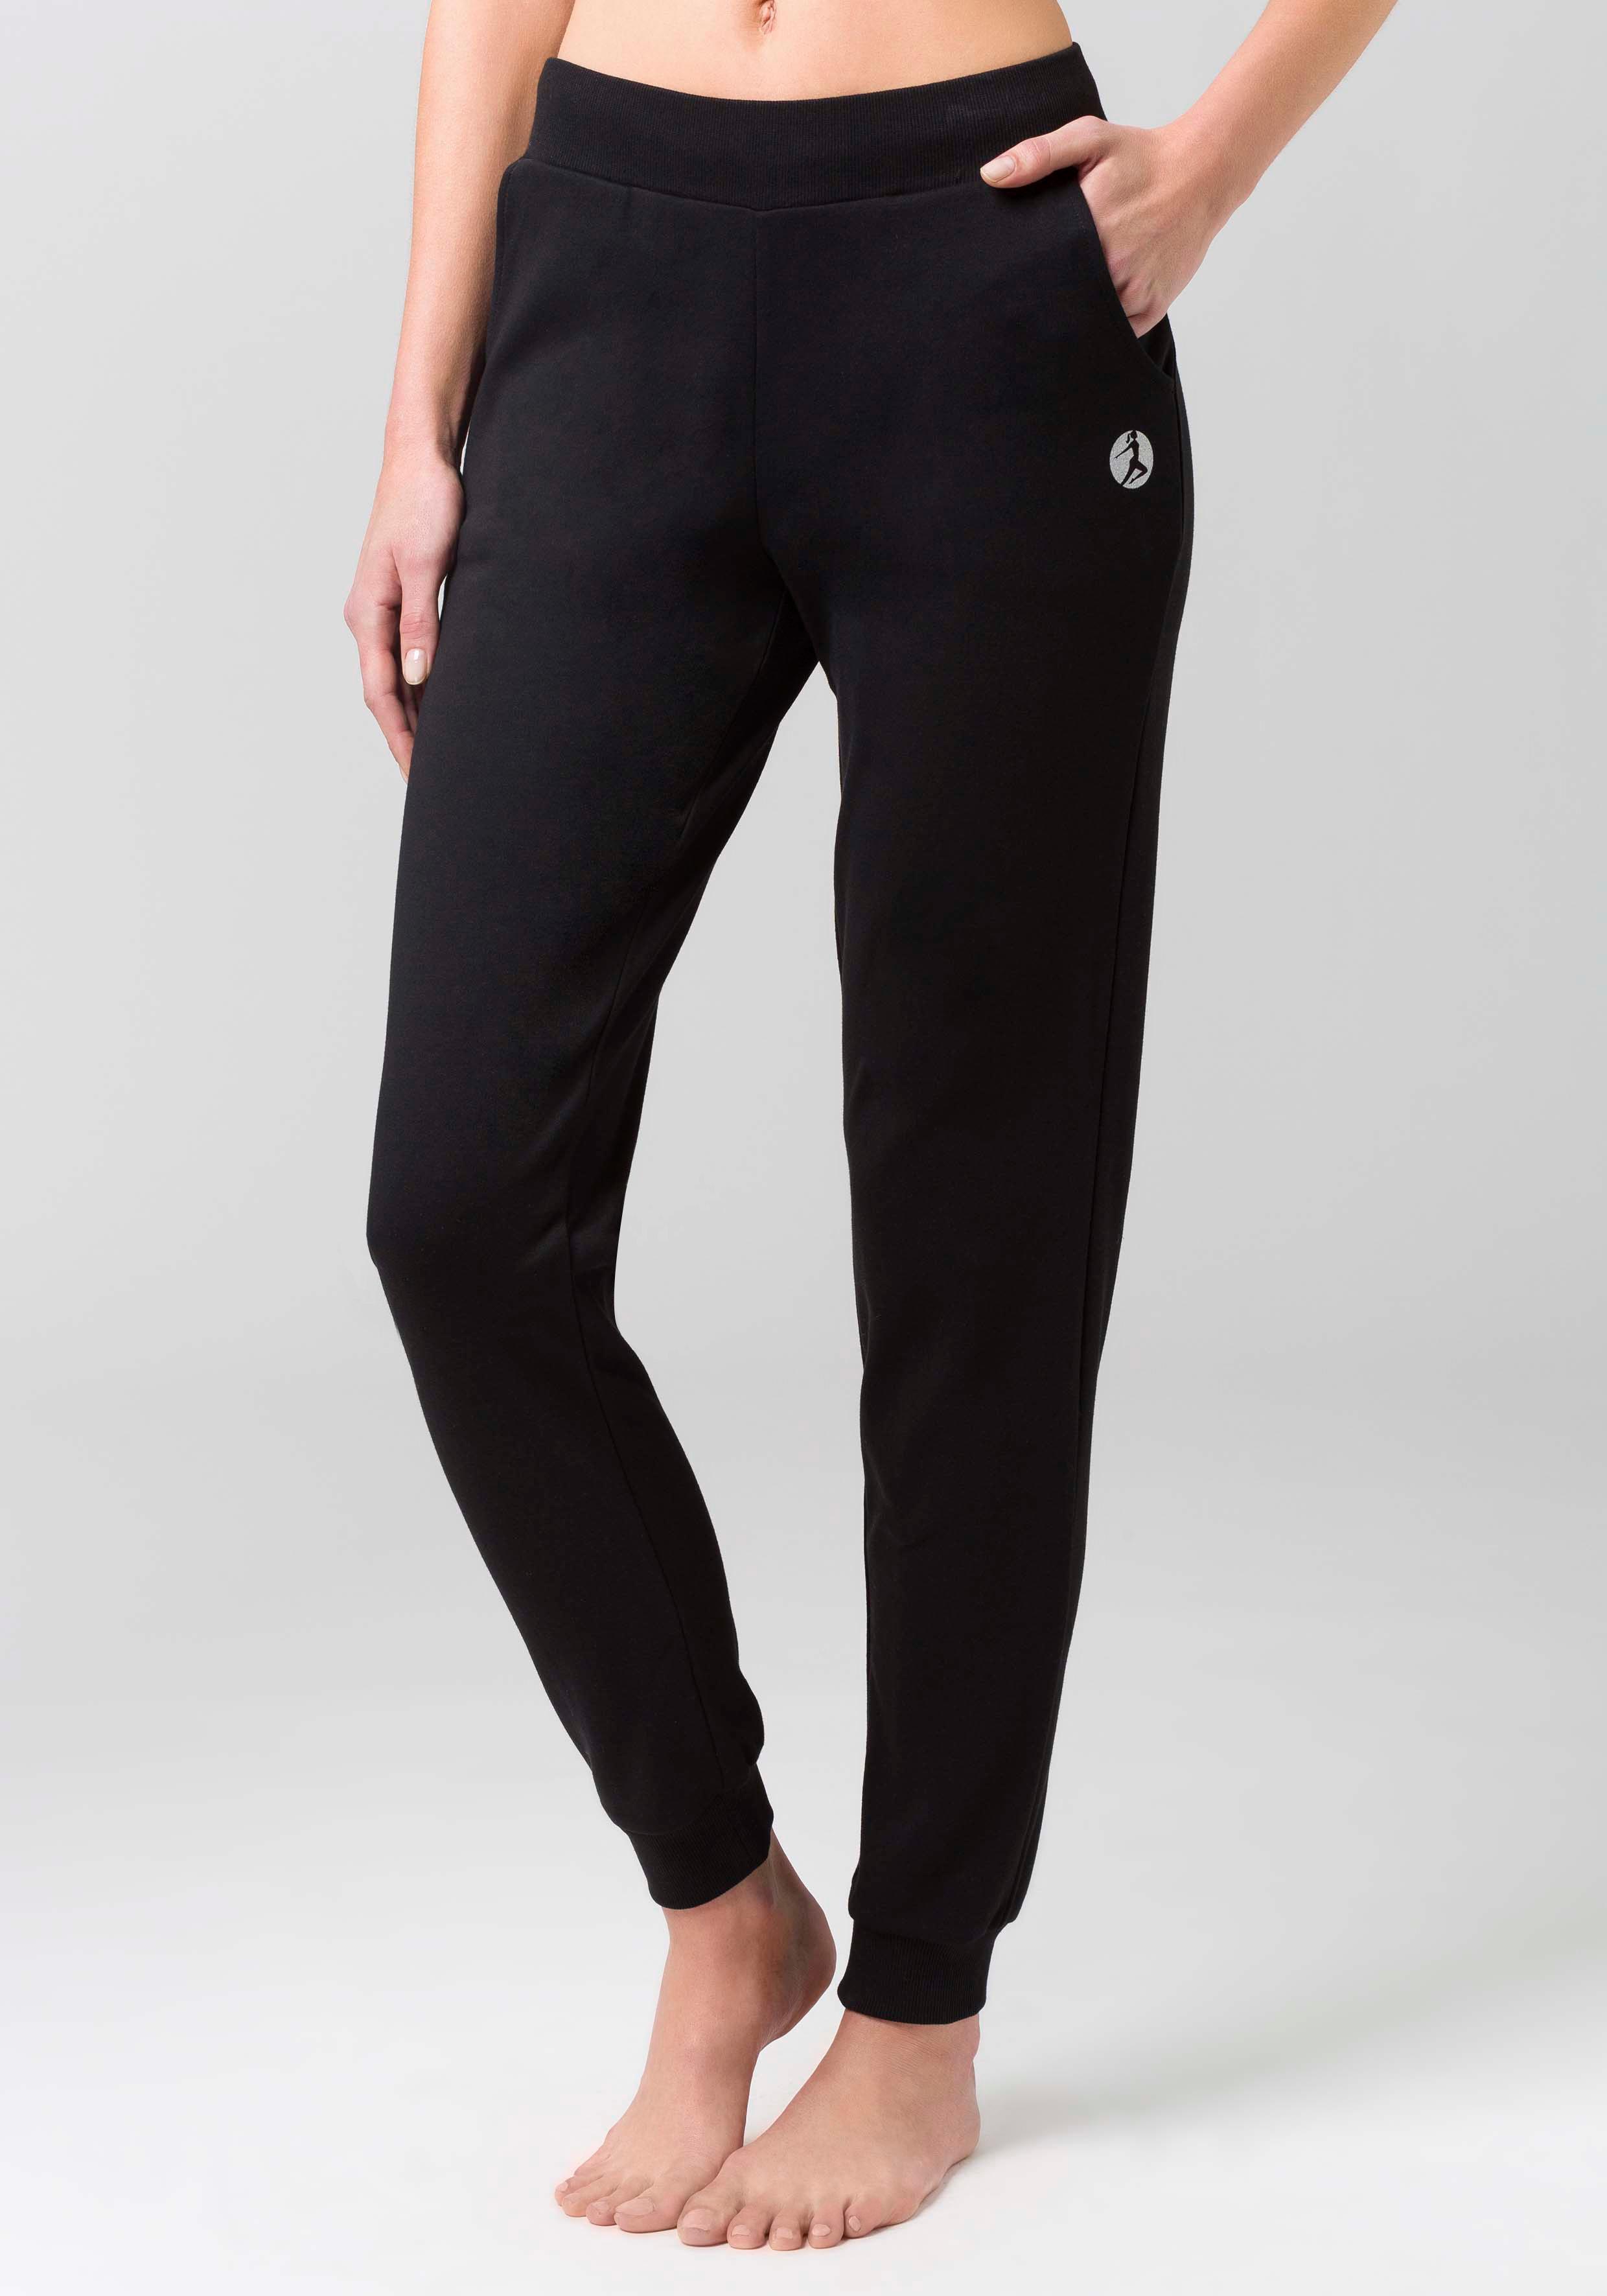 LASCANA Jogginghose | Sportbekleidung > Sporthosen | Lascana